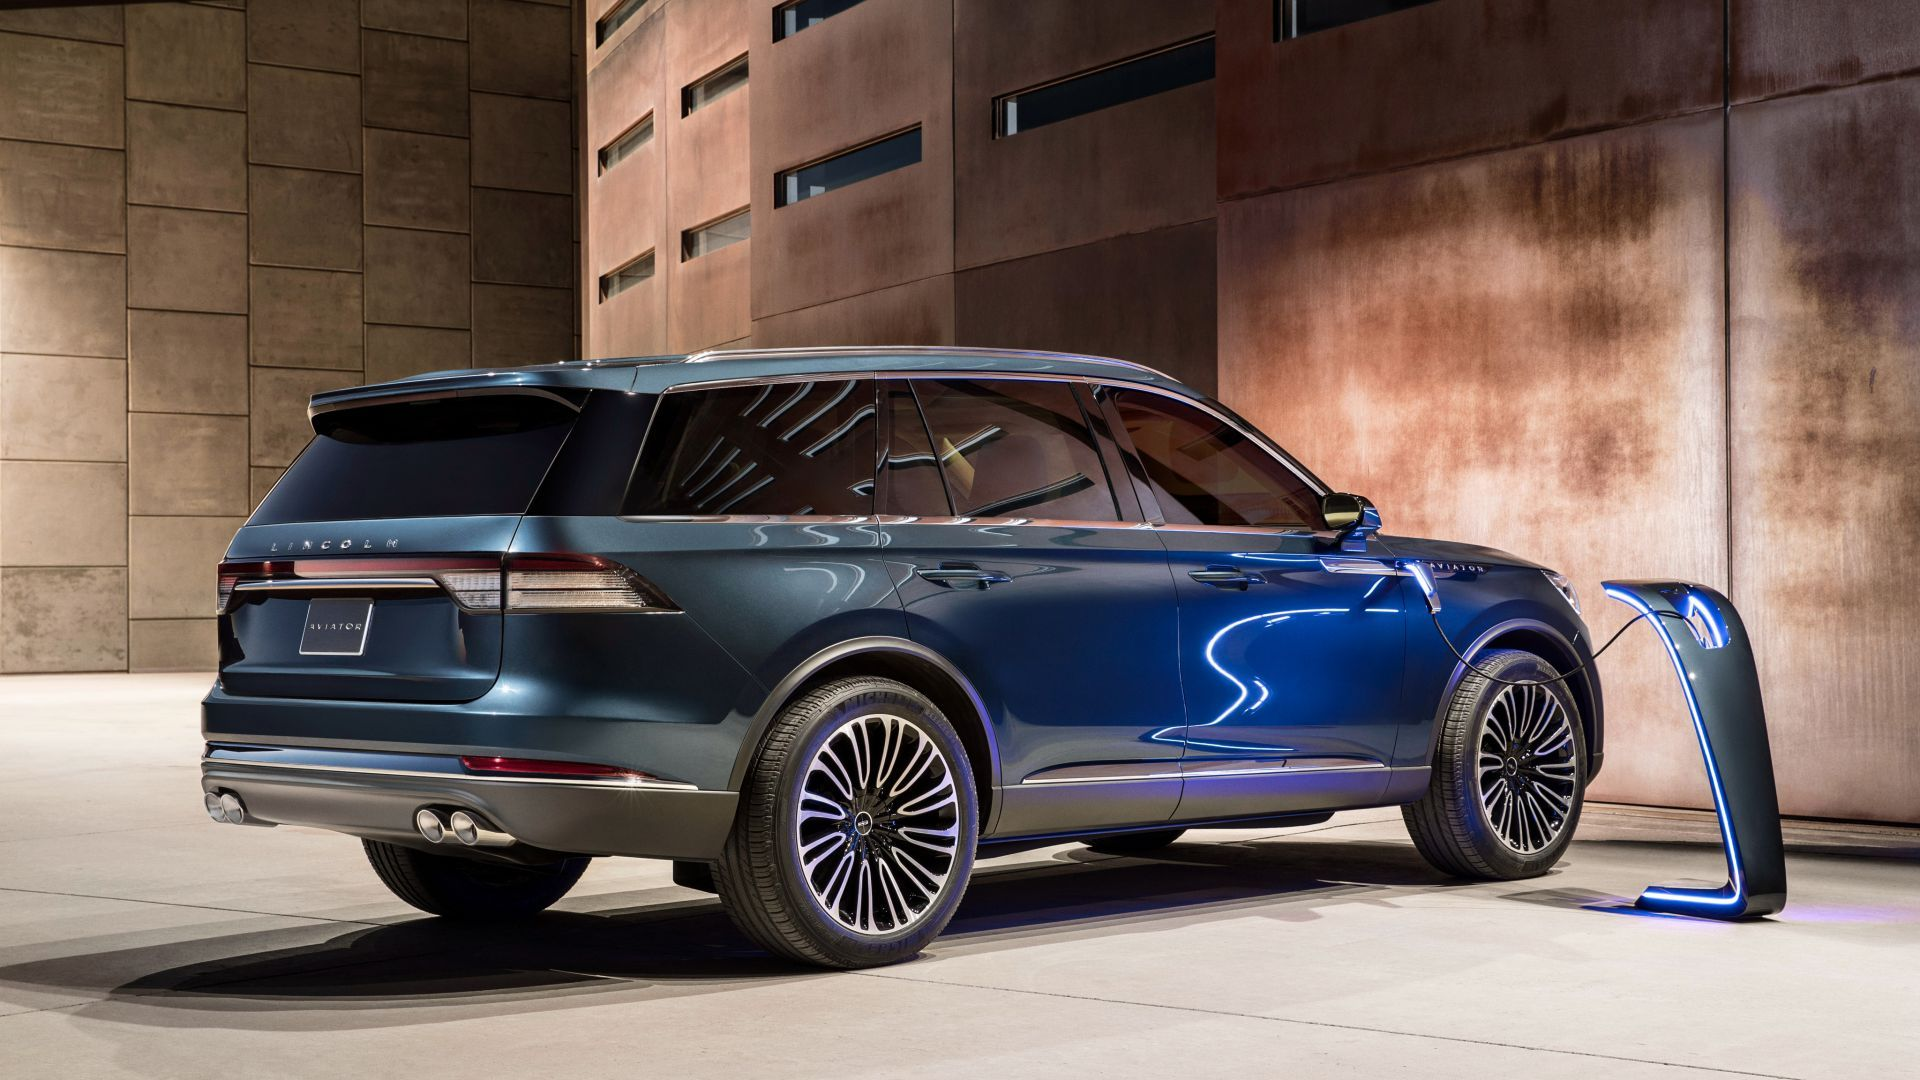 Lincoln Aviator Suv 2019 Cars Electric Car 4k Horizontal